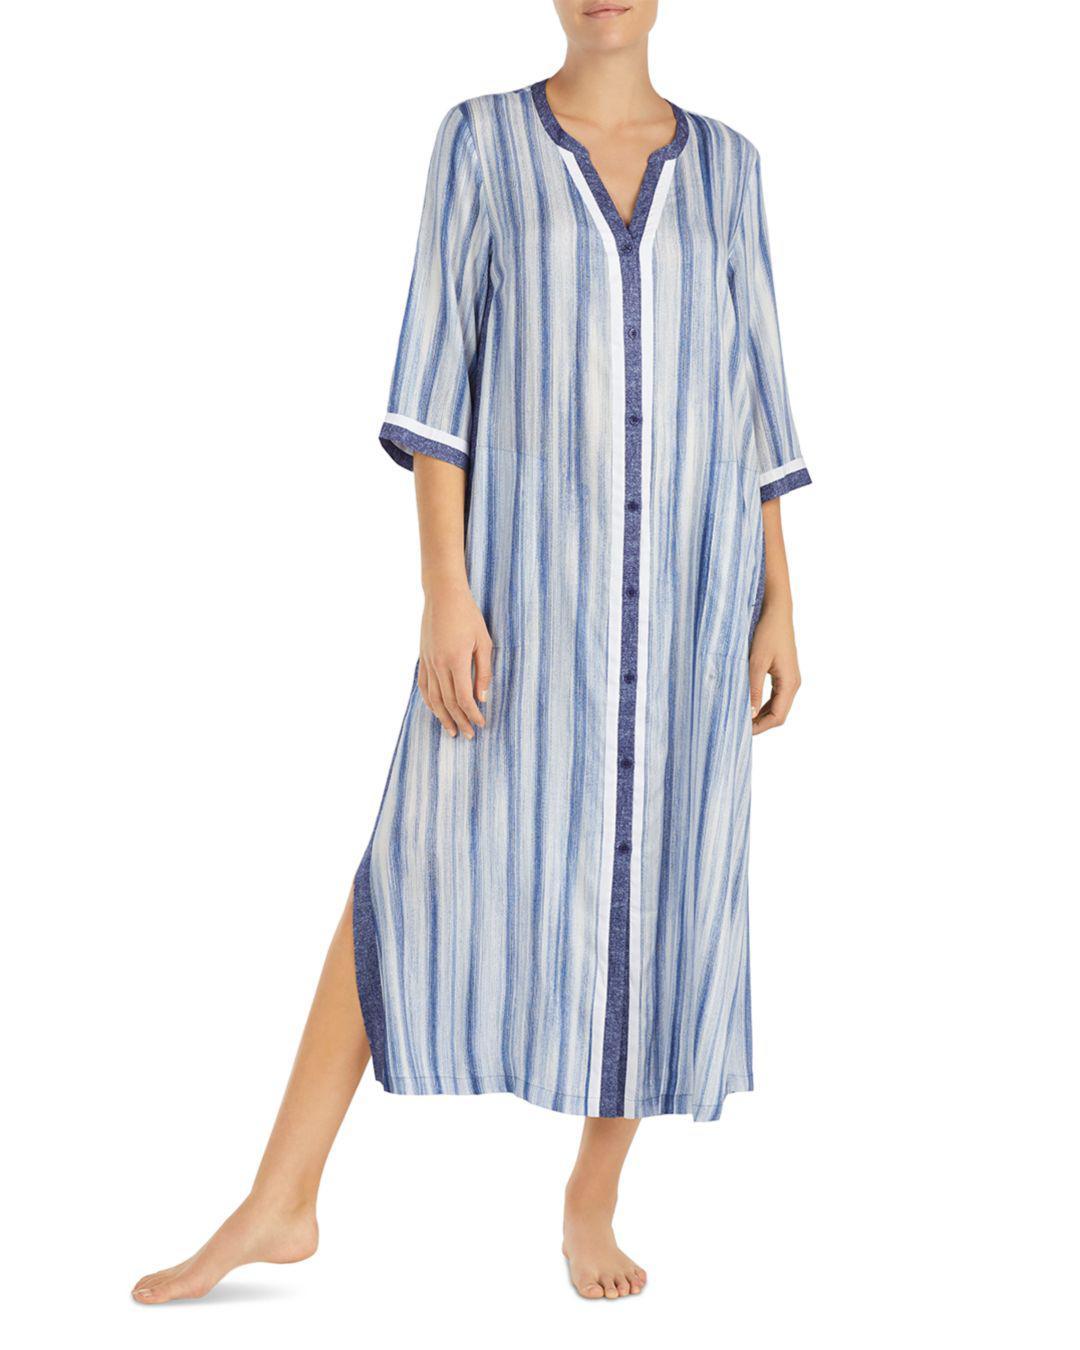 abc1db3adeeed5 Lyst - Donna Karan Striped Maxi Sleepshirt in Blue